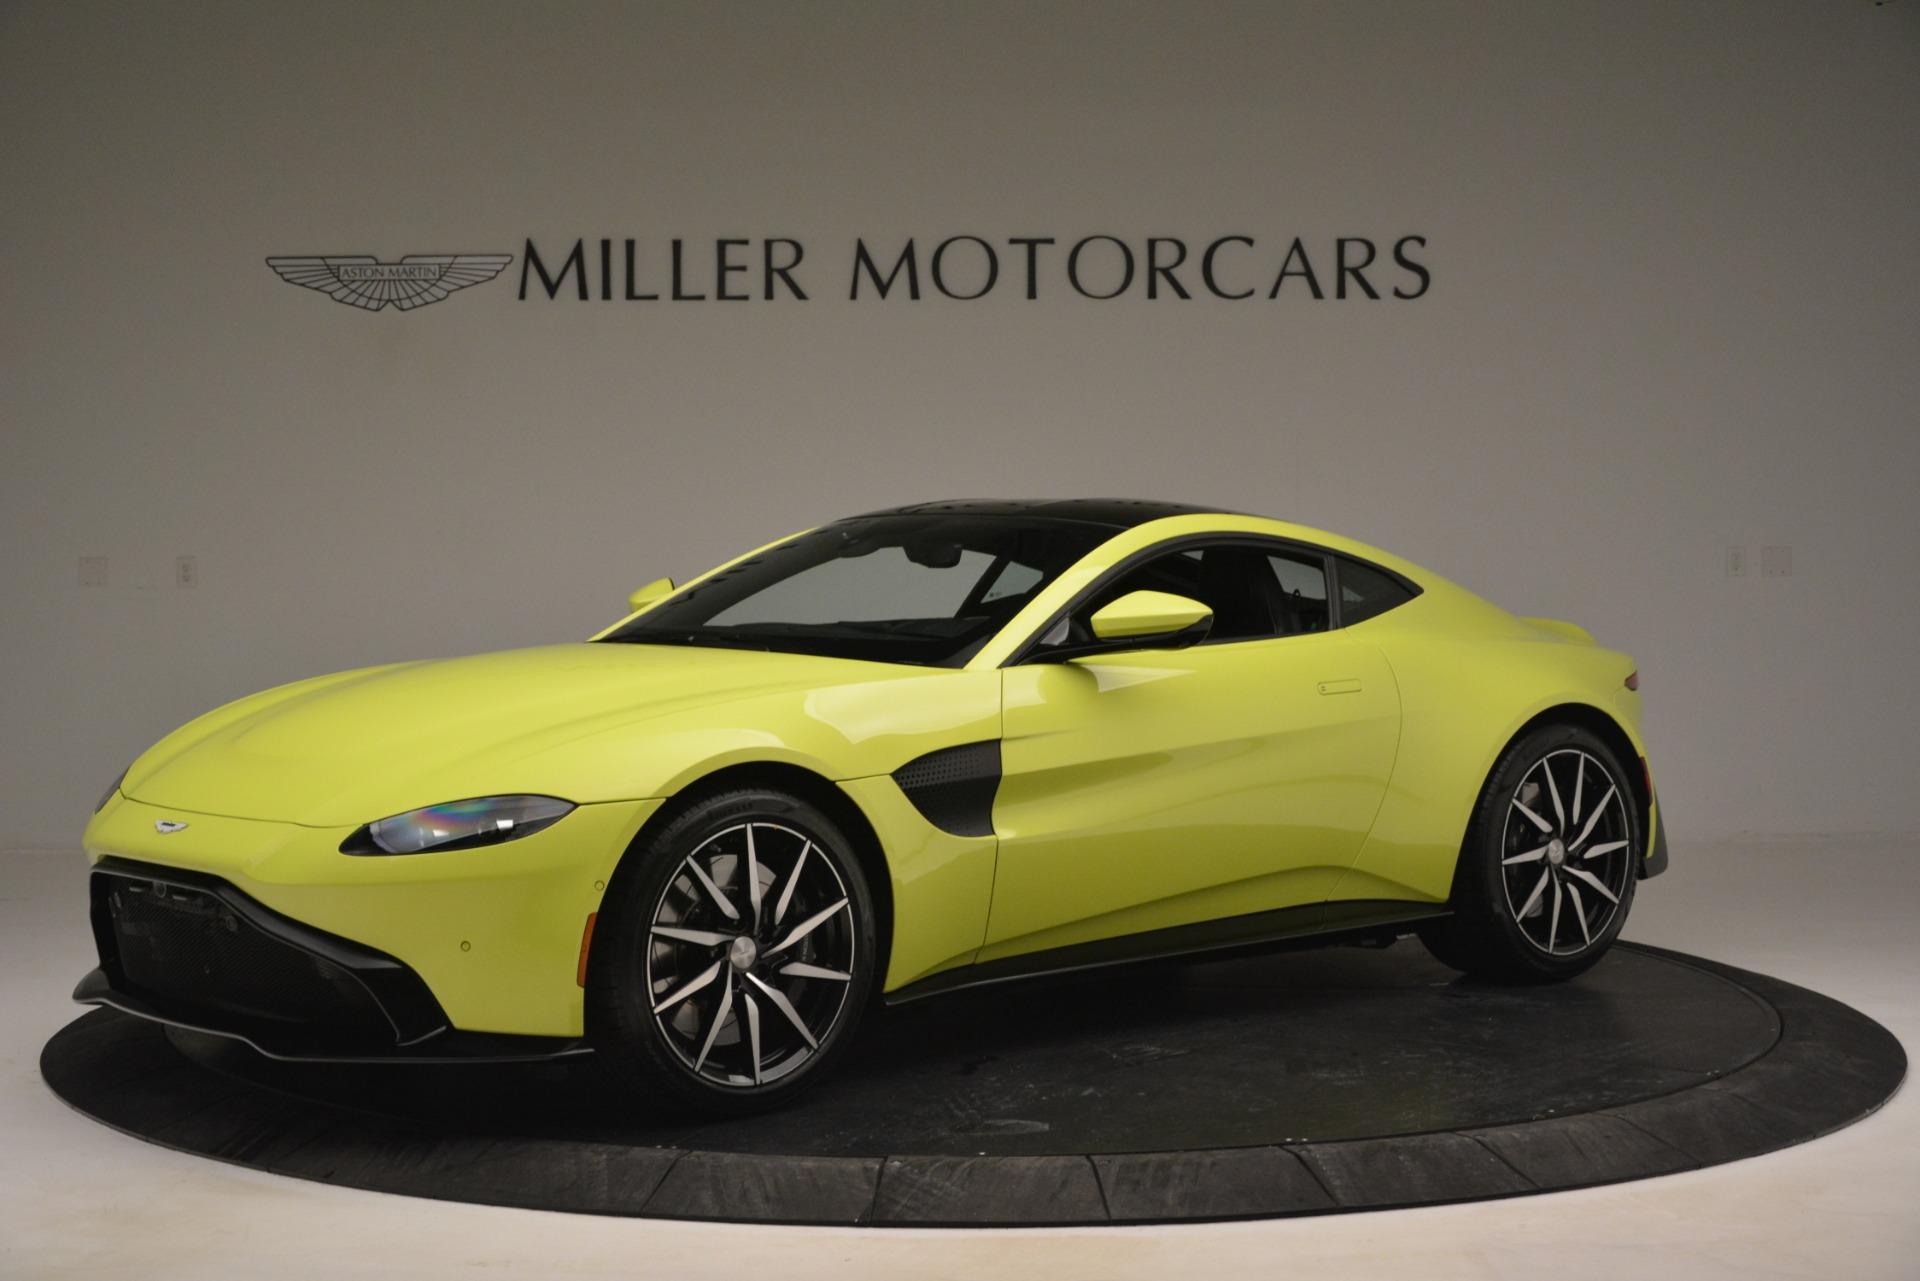 Pre Owned 2019 Aston Martin Vantage For Sale 162 900 Miller Motorcars Stock 7467